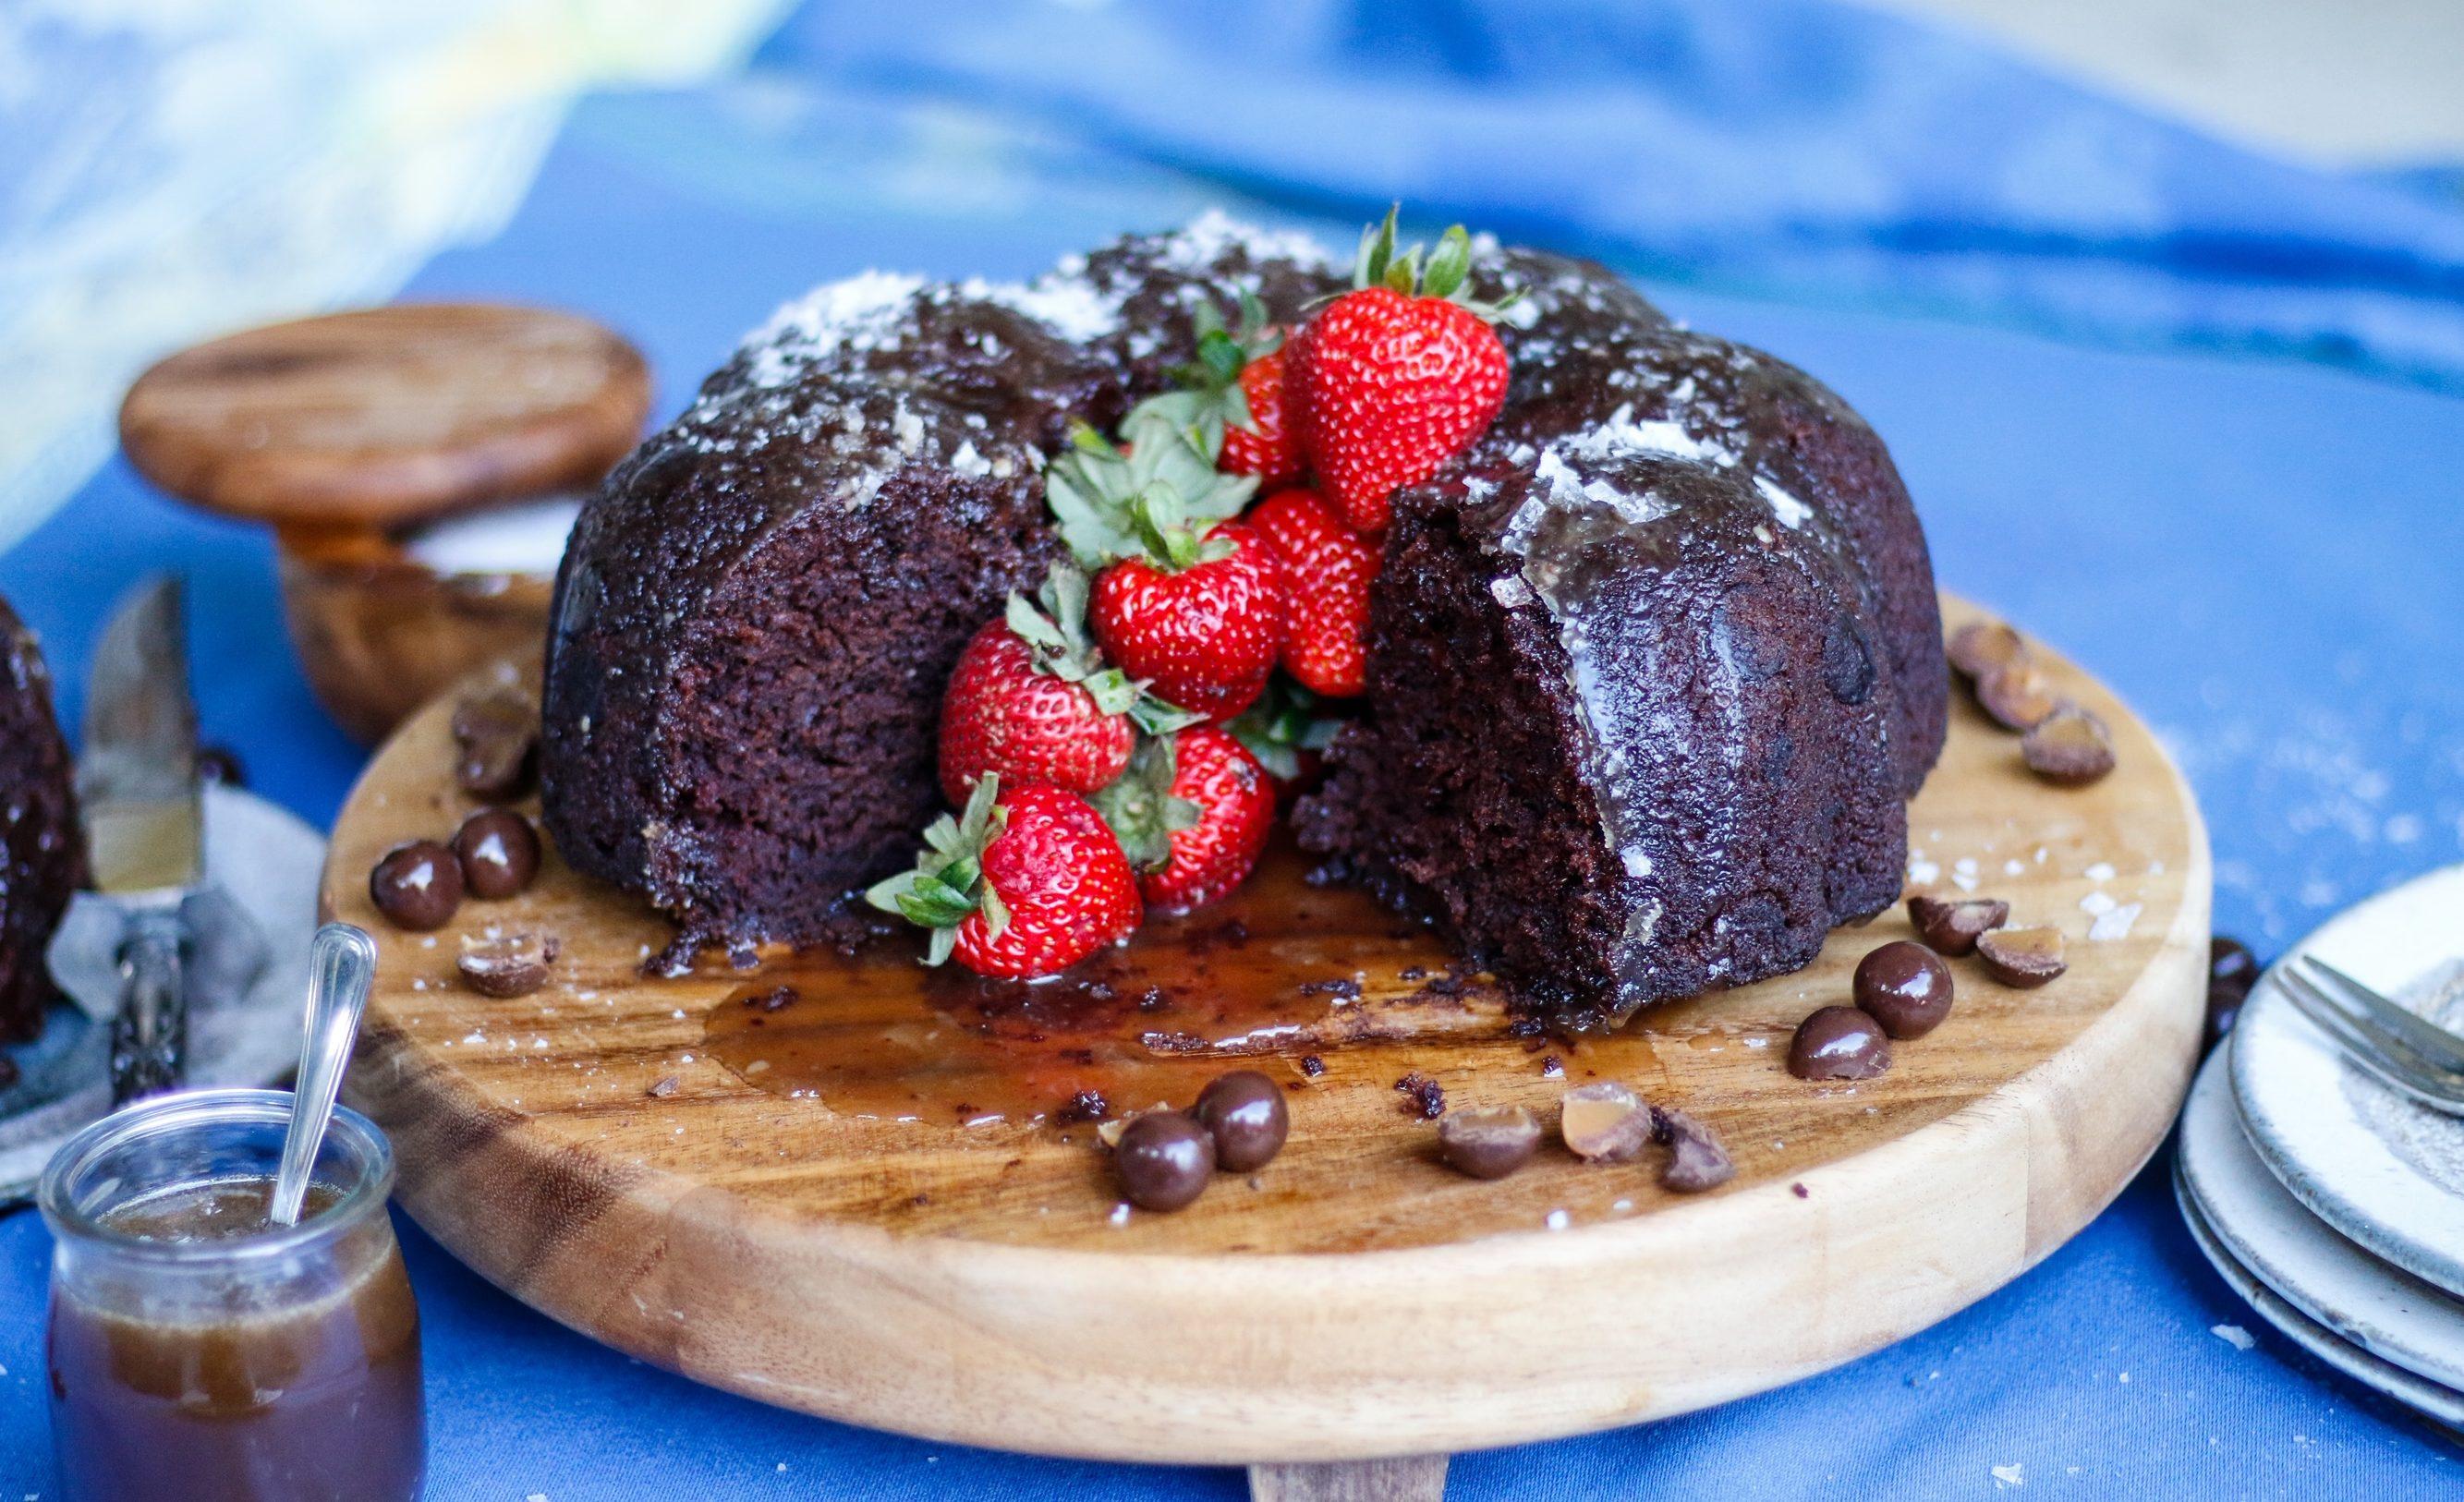 chocolate salted caramel poke cake, chocolate salted caramel cake, vegan chocolate cake, vegan chocolate salted caramel cake, caramel poke cake